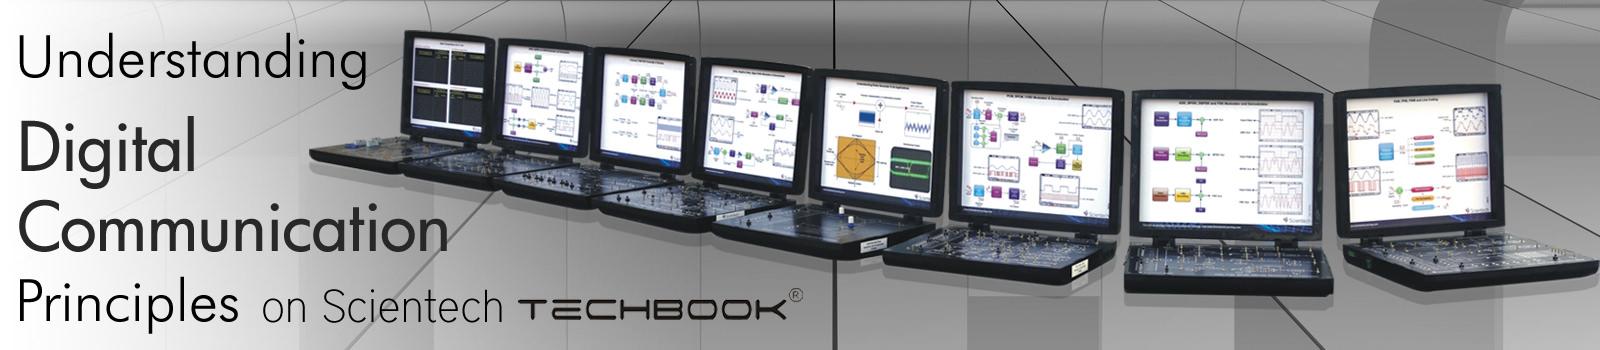 Digital Communication Trainer Kits | Laboratory Training